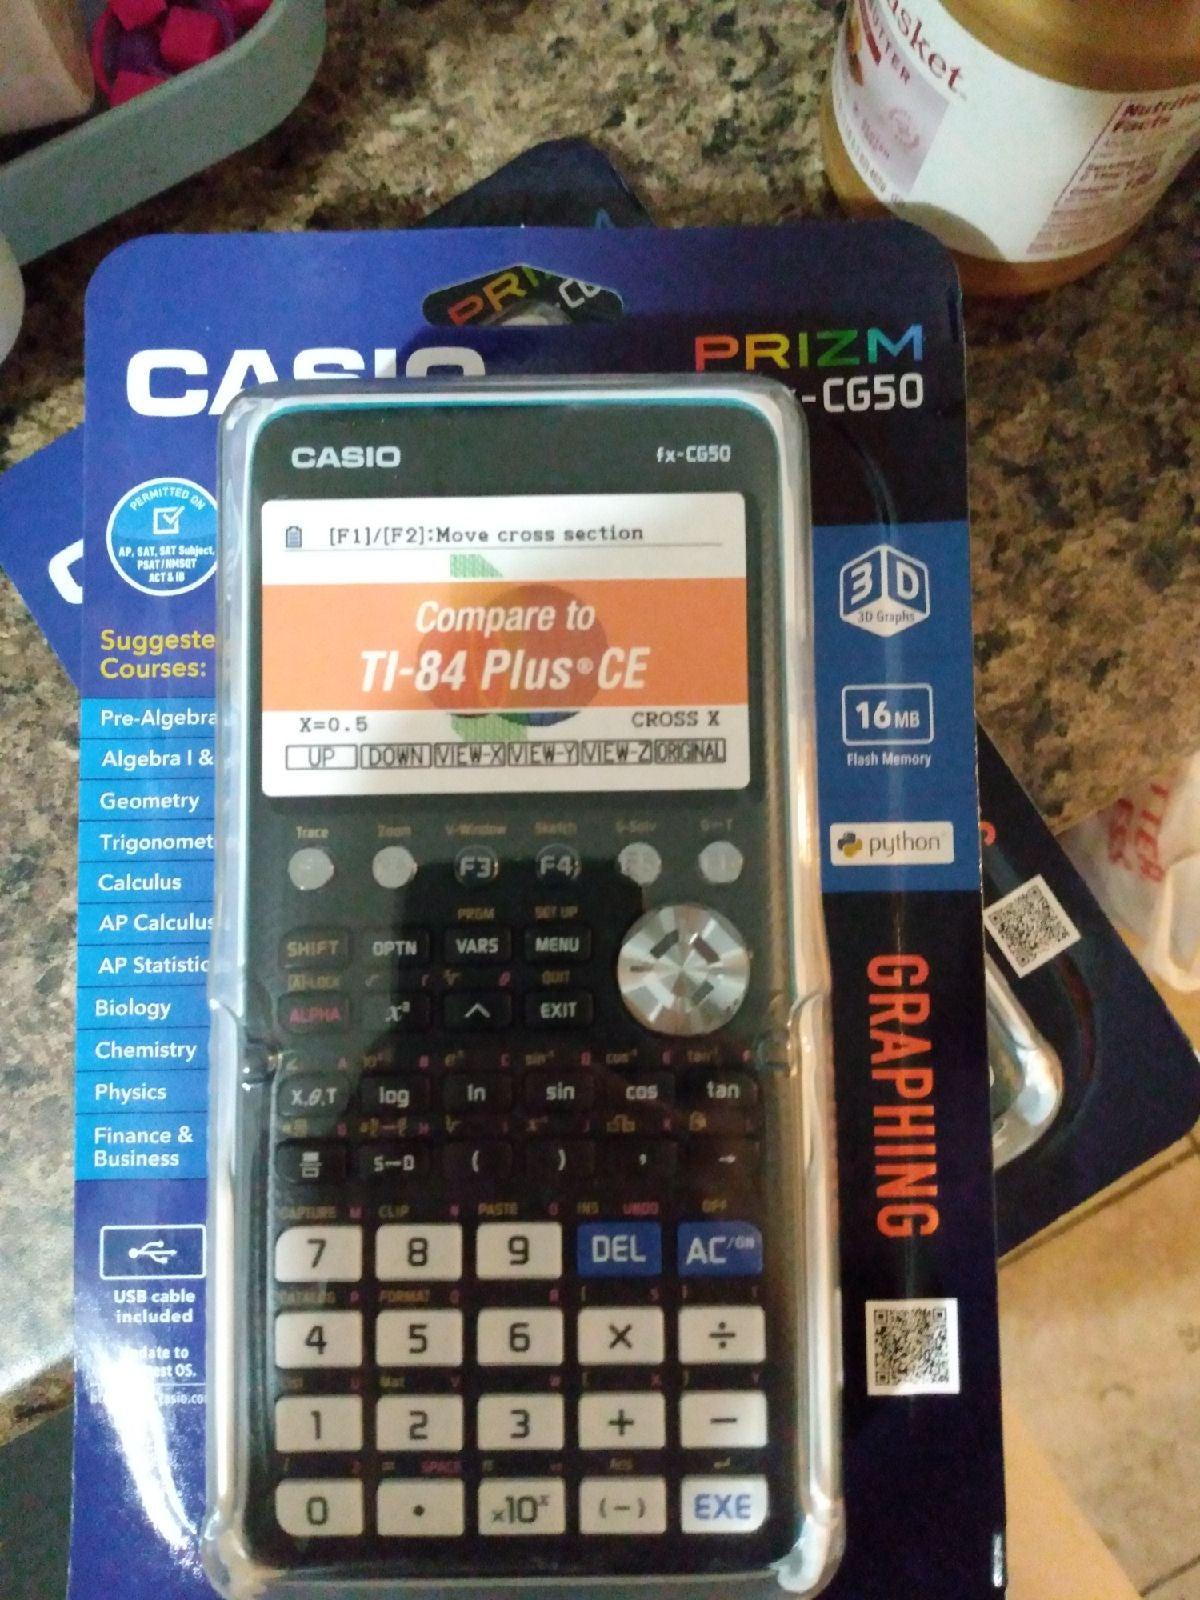 Casio prizm Graphing Calculator